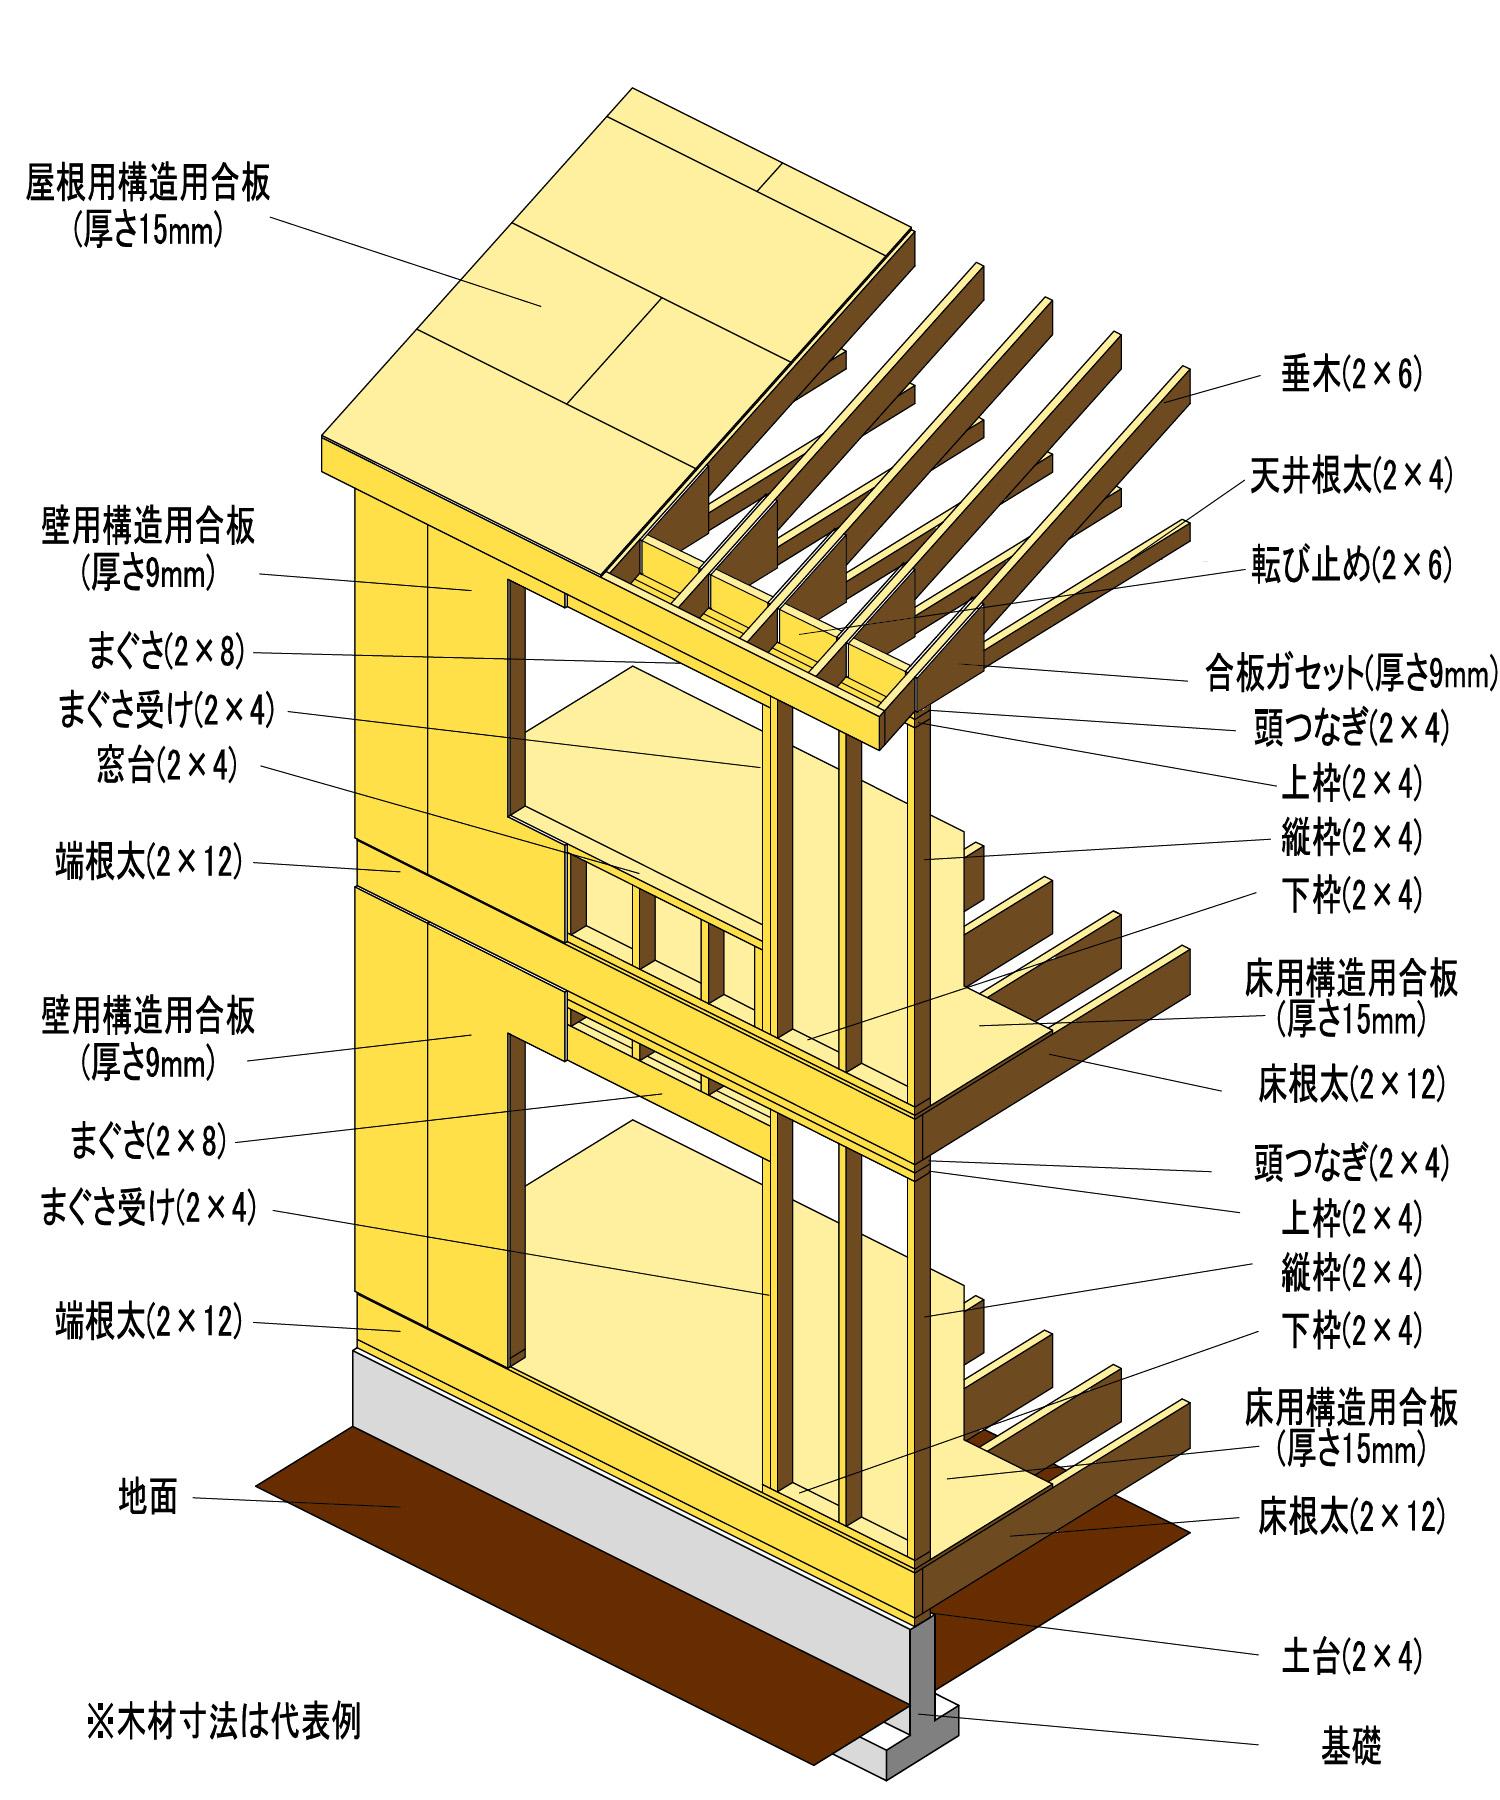 file:wakugumikabekouhou 01 - wikimedia commons